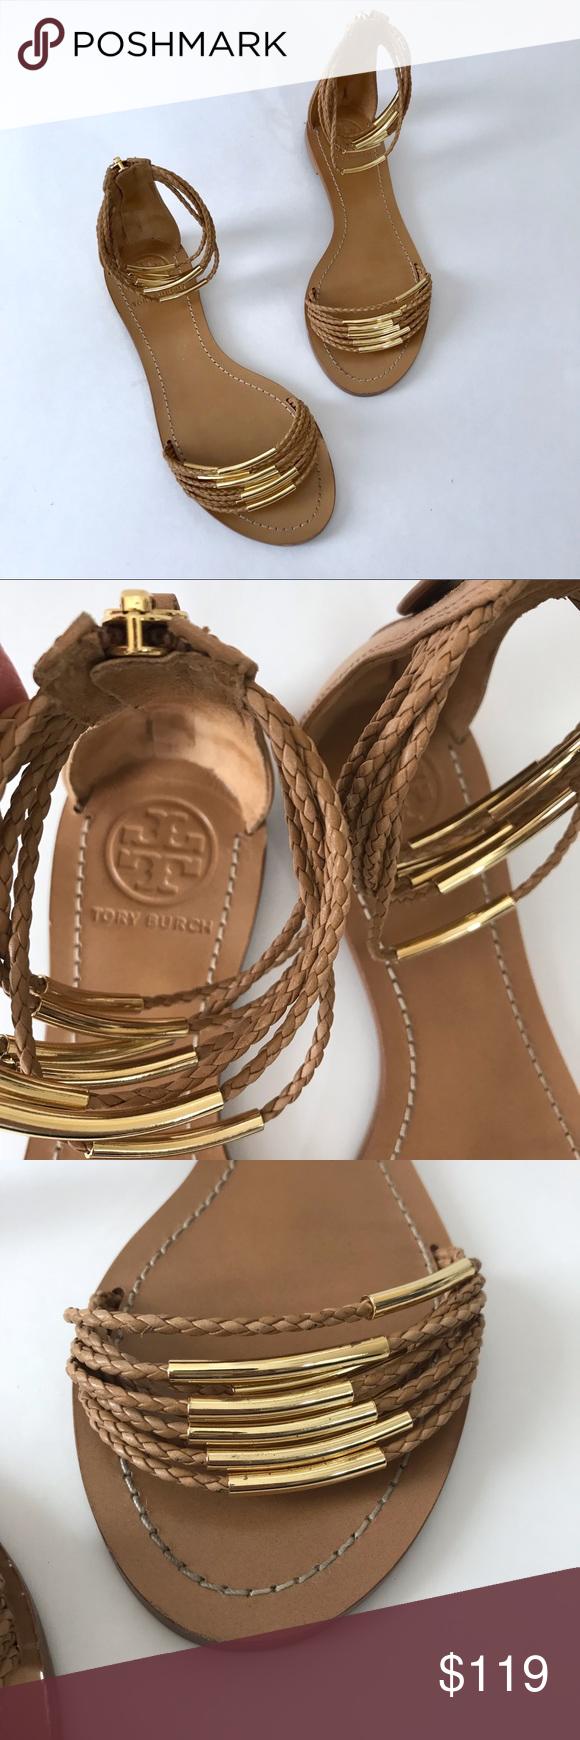 c5b6dd6cea8f Tory Burch Nude Gold Sandals Mignon Braided EUC 7 EUC - excellent used  condition. Worn